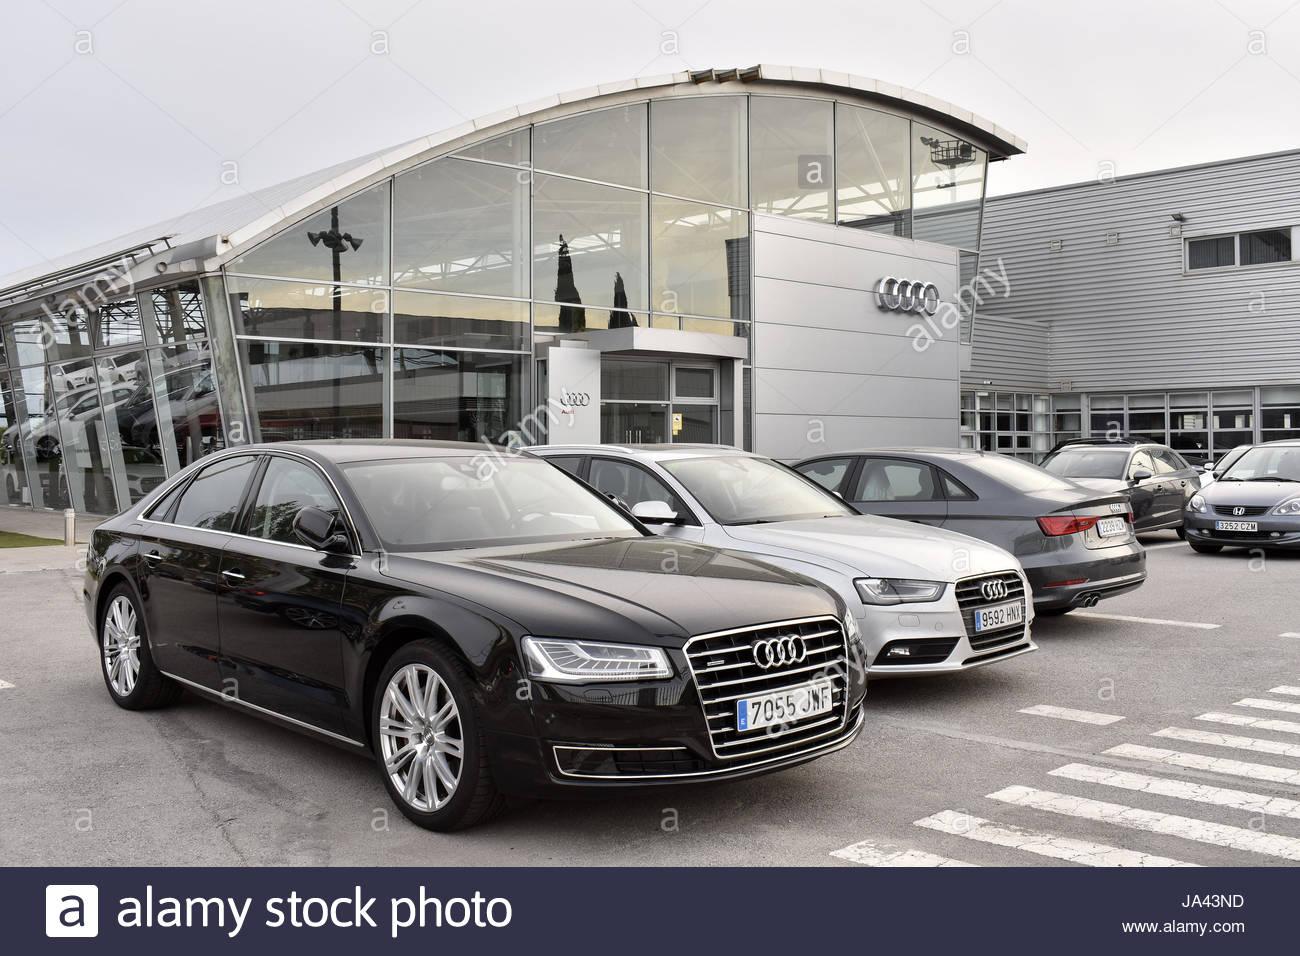 Audi Cars Dealer Store In Barcelona Spain Europe Stock Photo - Audi car dealers